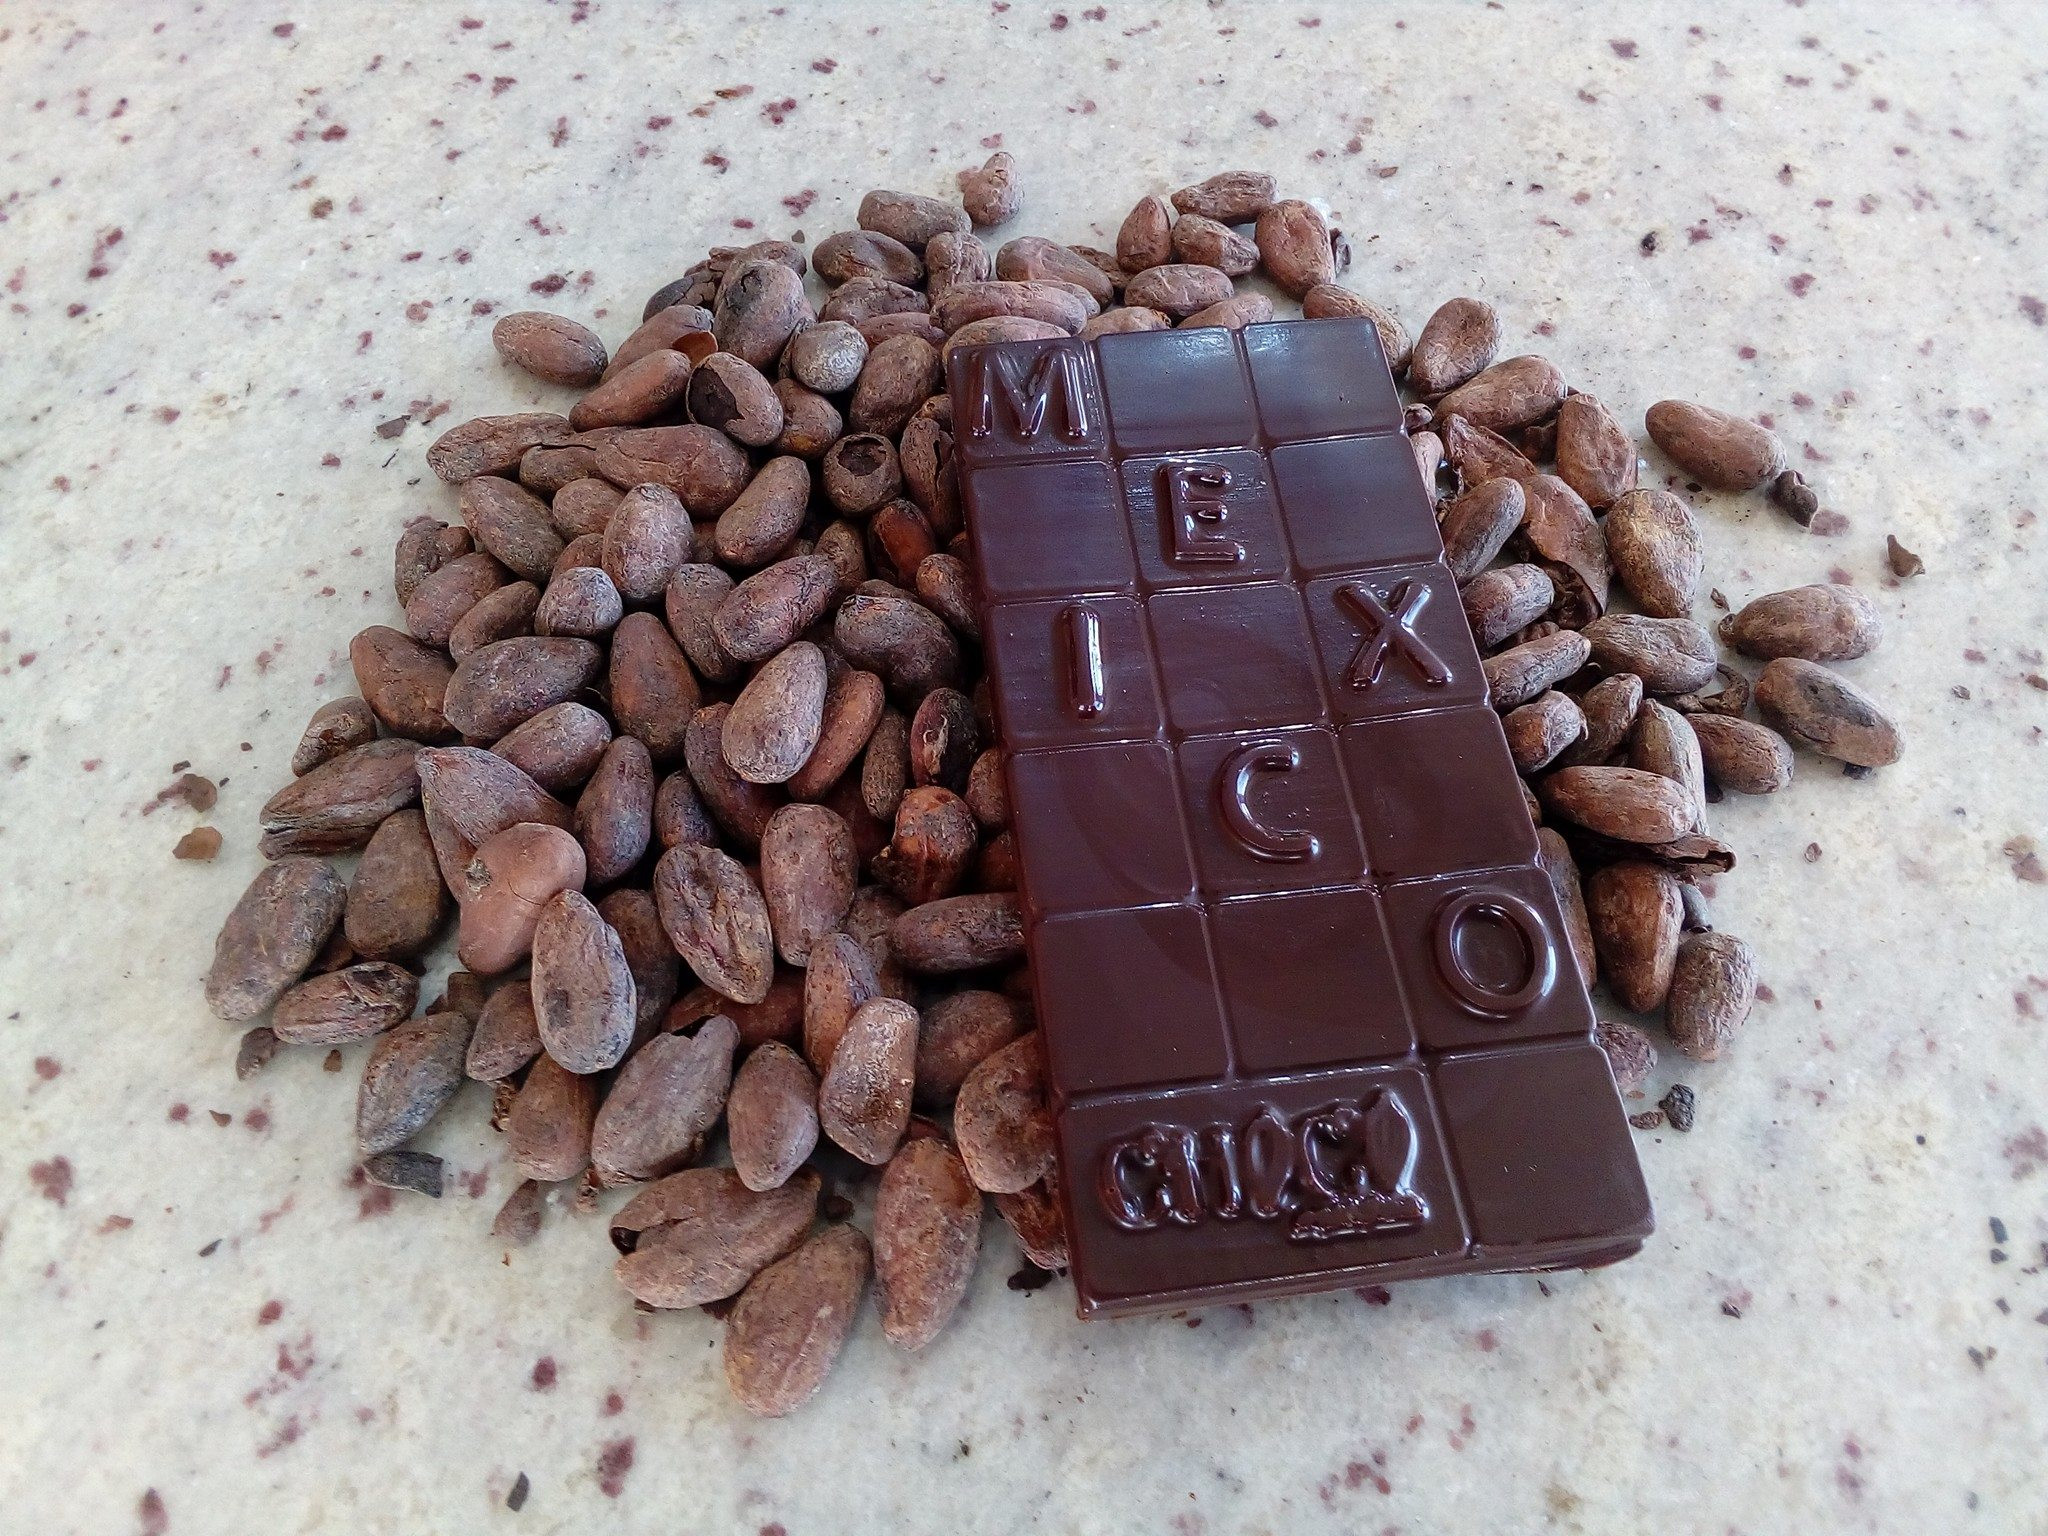 Chocolate101